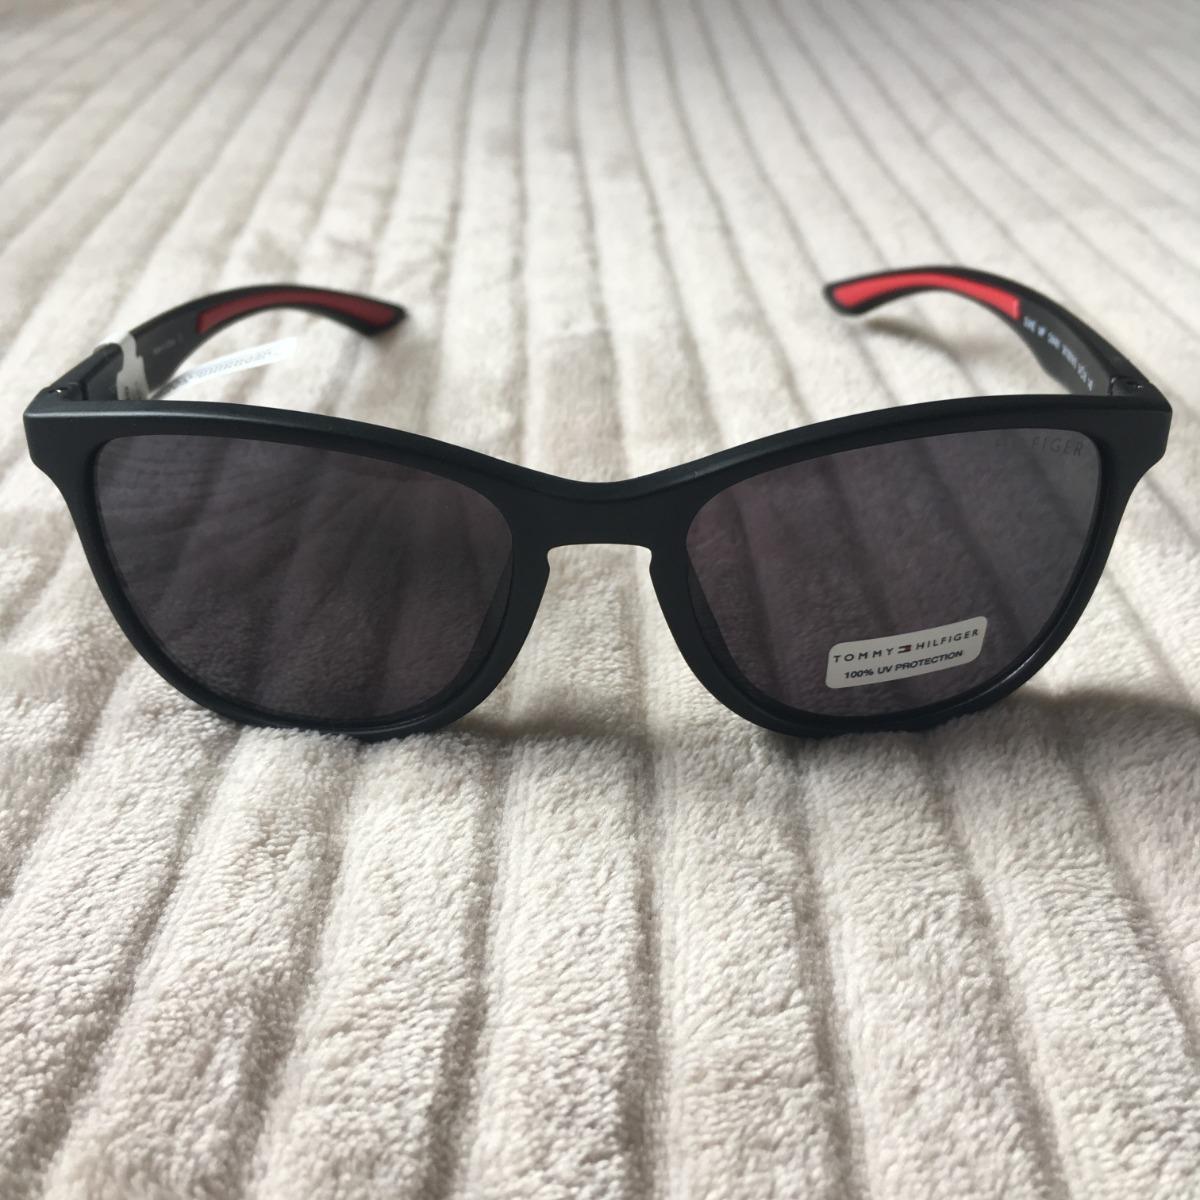 8c2f13d72 Oculos Sol Tommy Hilfiger Feminino Importado - R$ 149,90 em Mercado ...